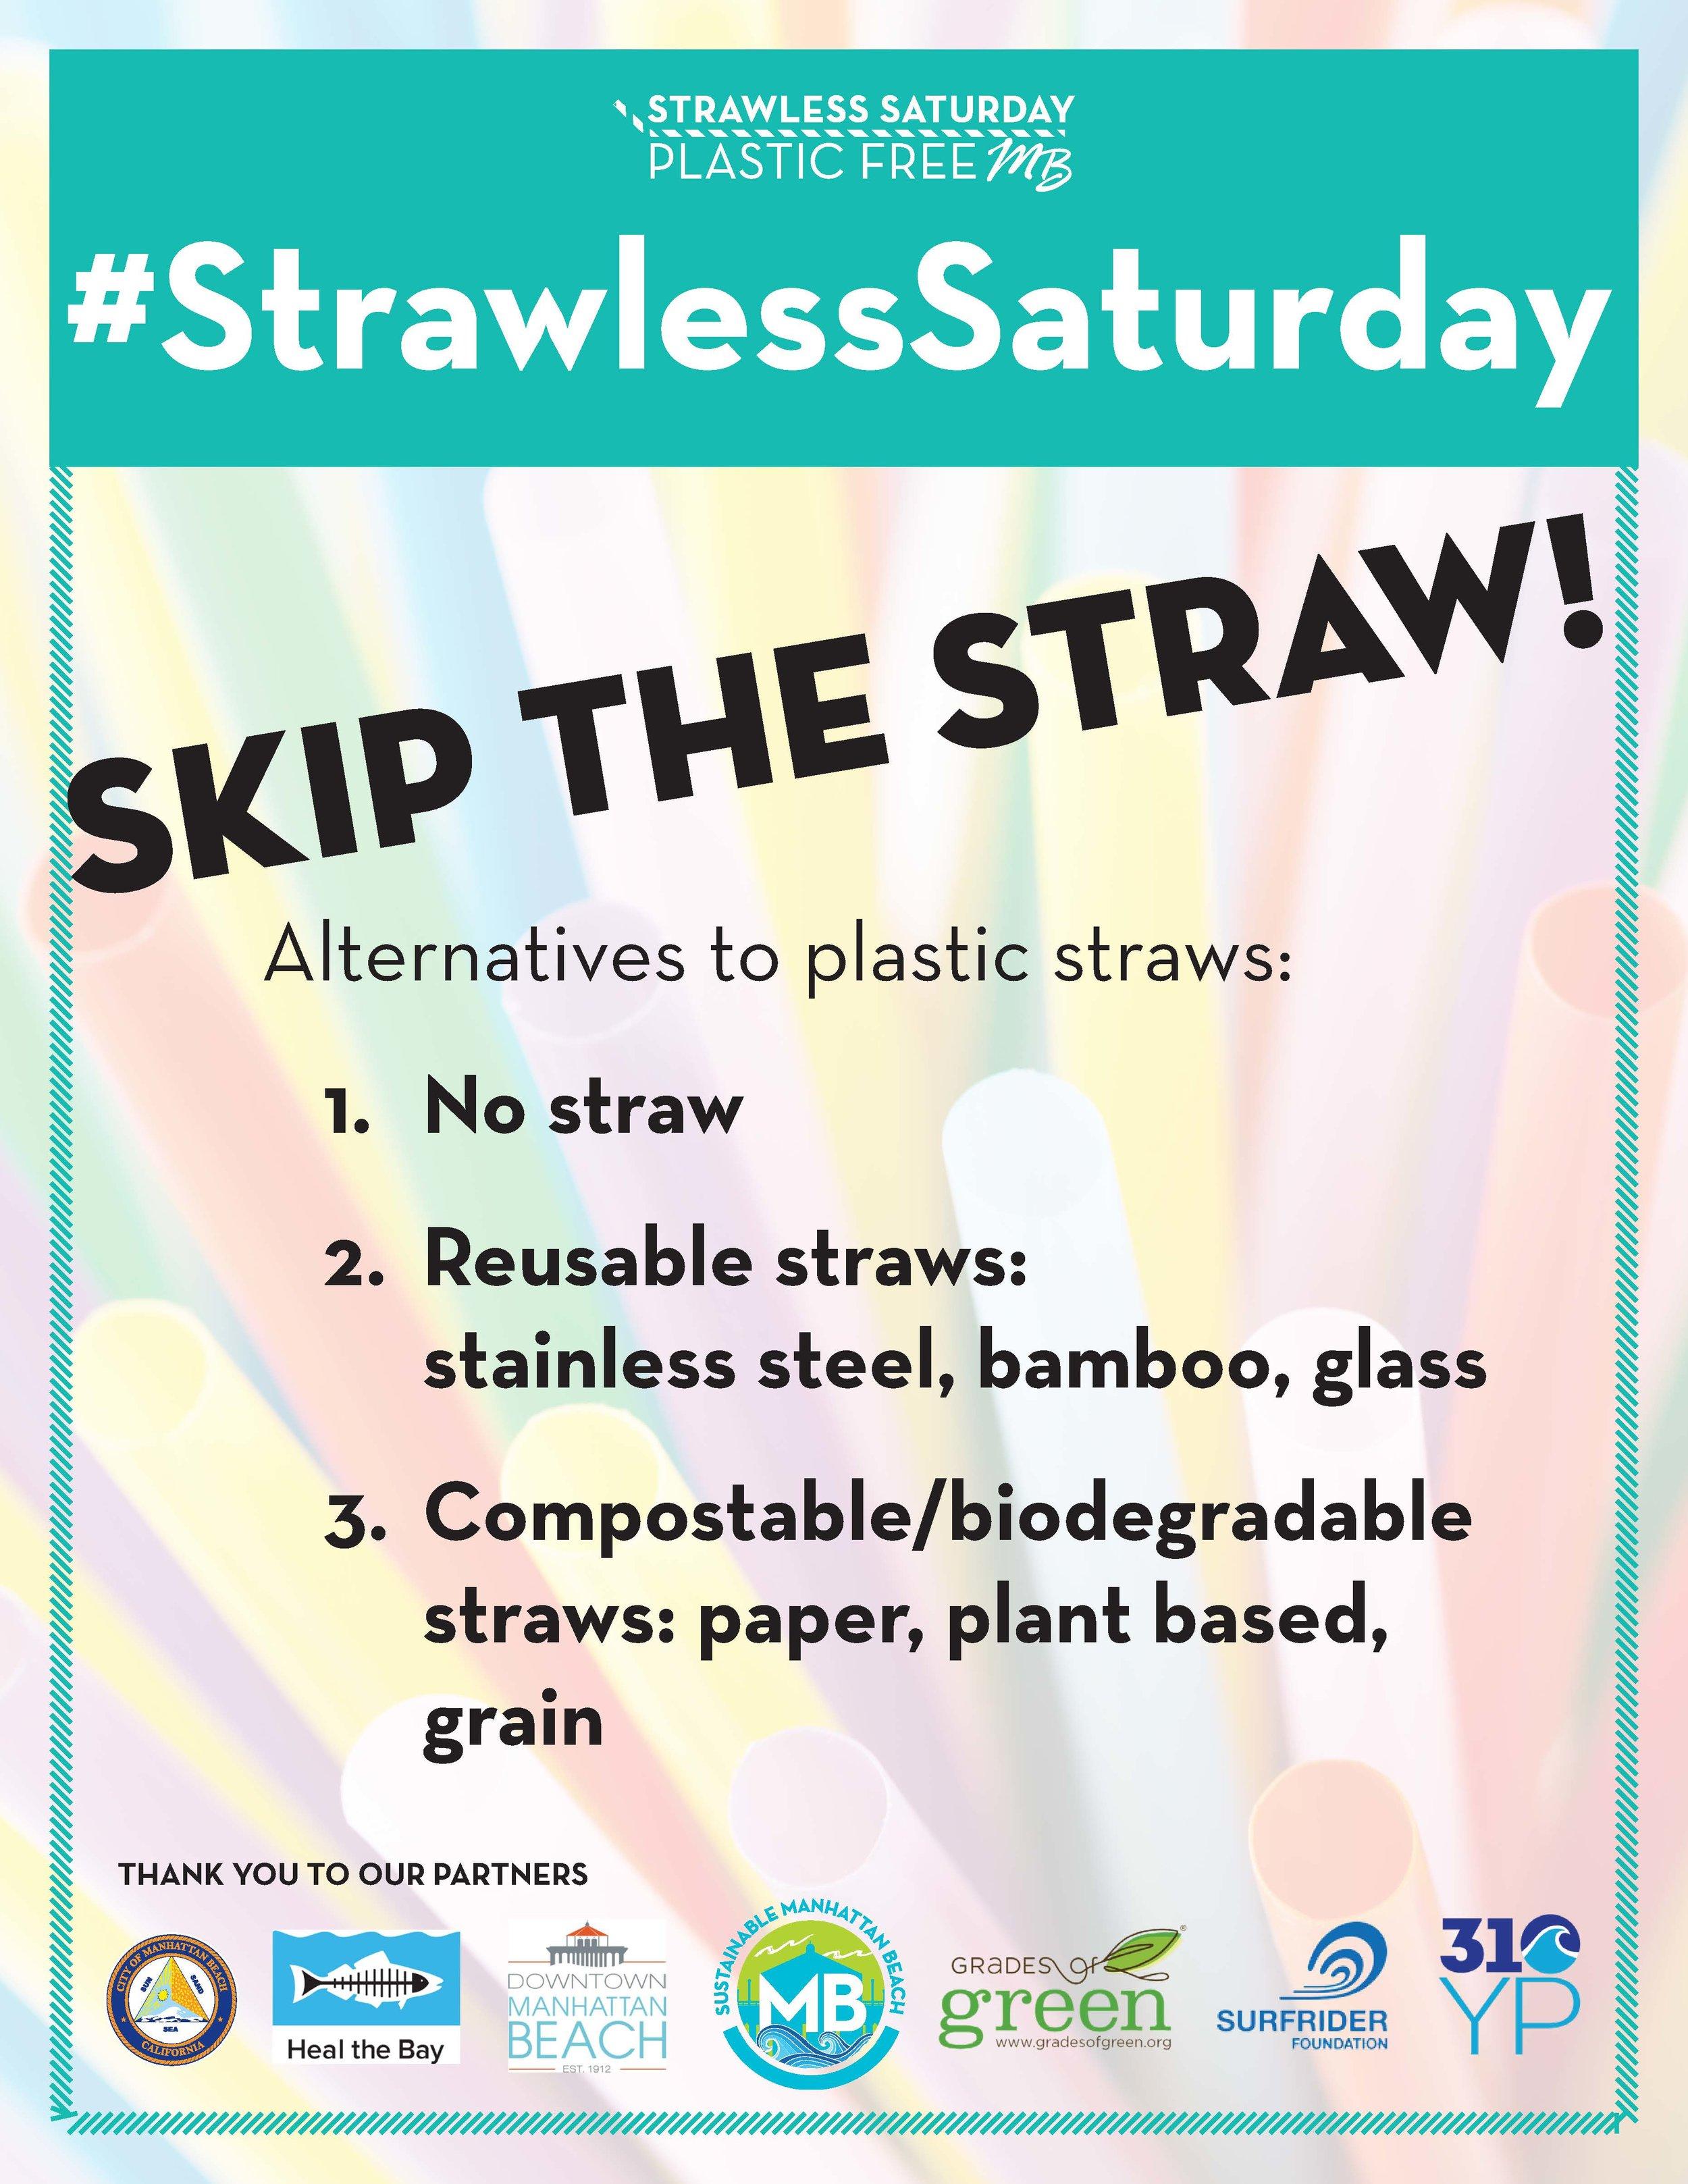 #StrawlessSaturdaySkip the straw on Saturdays in Downtown Manhattan Beach!Alternatives to plastic straws:1.No straw2.Reusable straws:stainless steel, bamboo, glass3. Compostable/biodegradable straws: paper, plant based, grain. -